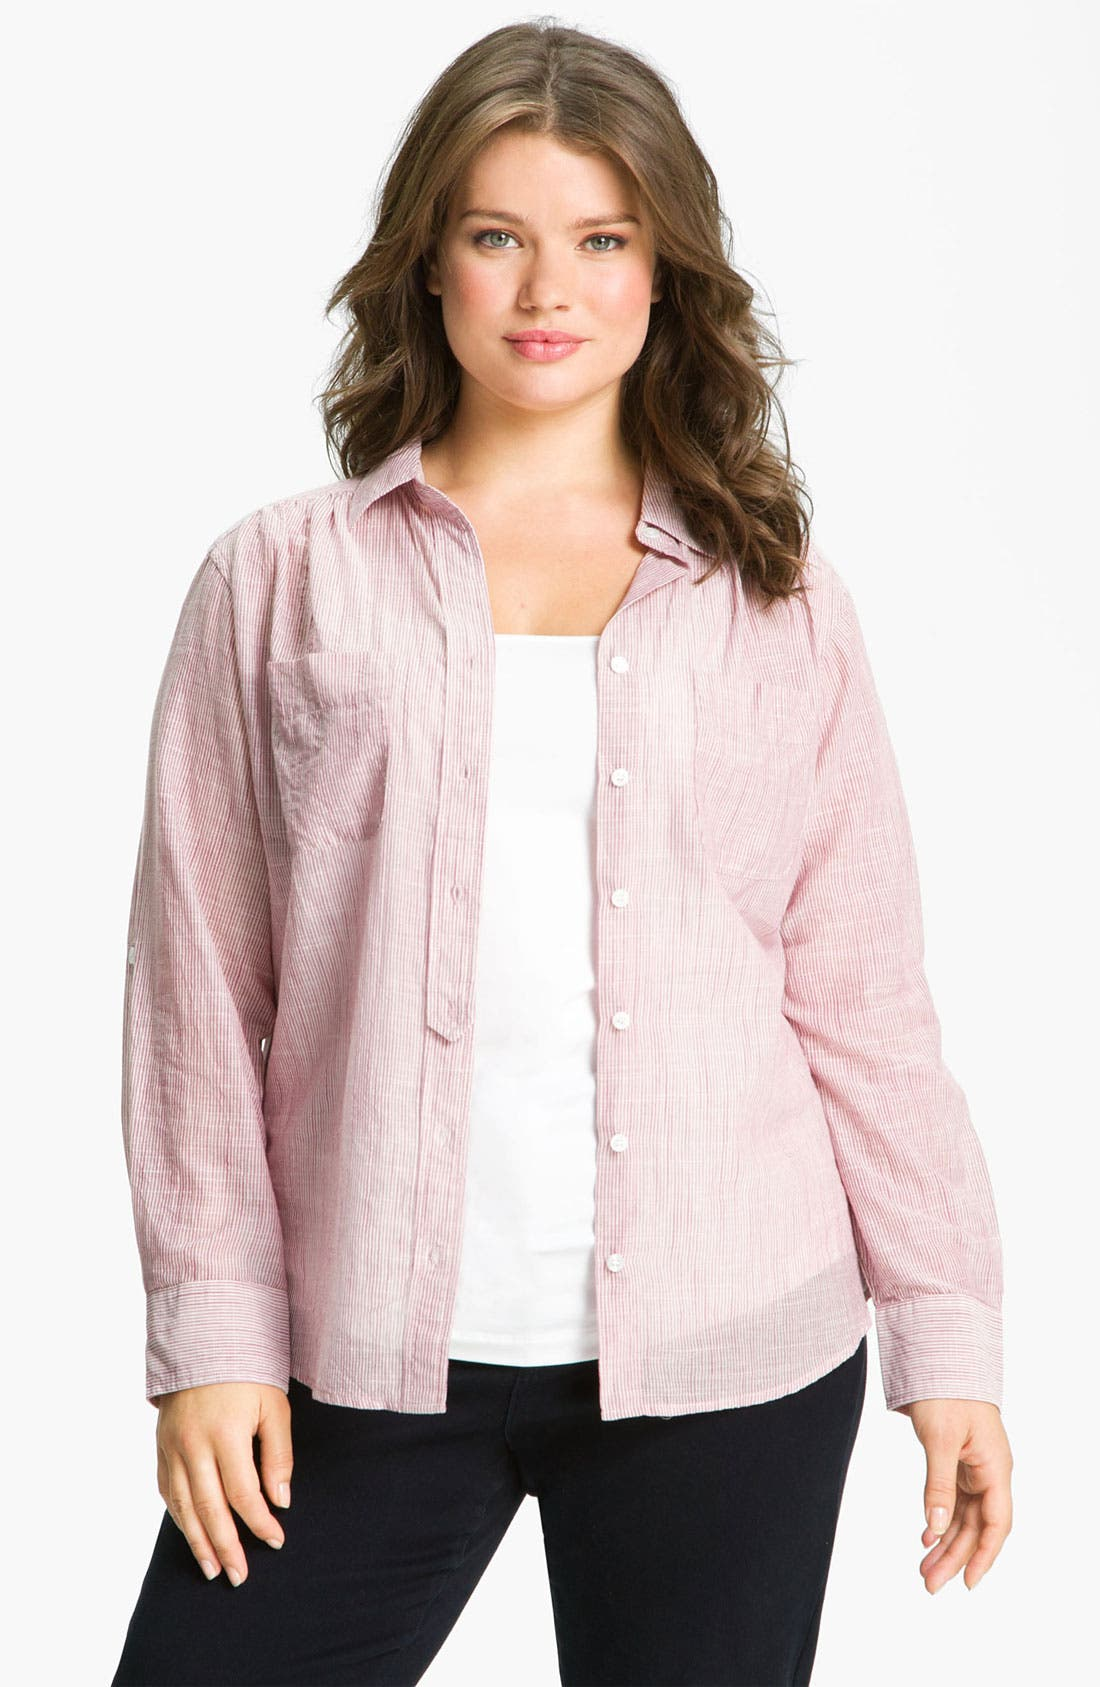 Alternate Image 1 Selected - Sandra Ingrish Stripe Roll Sleeve Shirt (Plus)